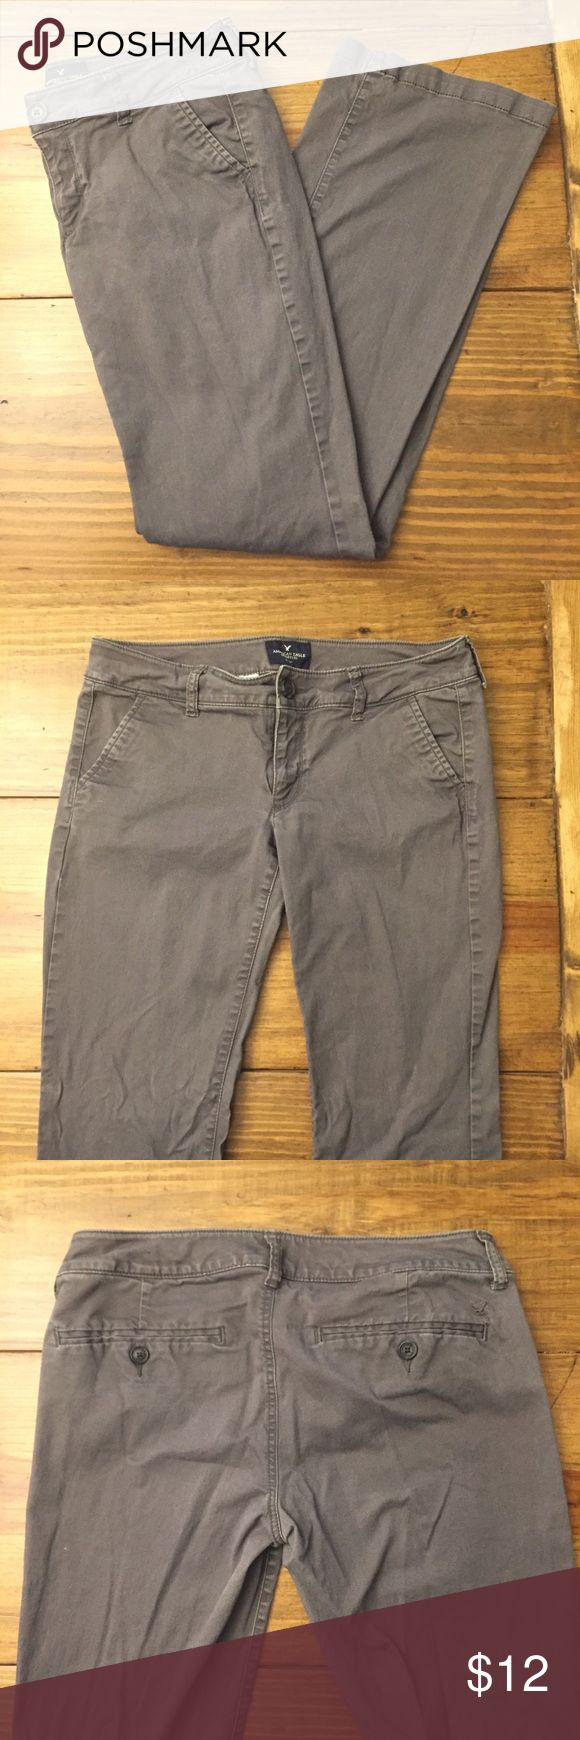 American Eagle Outfitters Kick Boot Grey Pants 6 Women's size 6 Gray Kick Boot Khaki Pants Good condition. No marks American Eagle Outfitters Pants